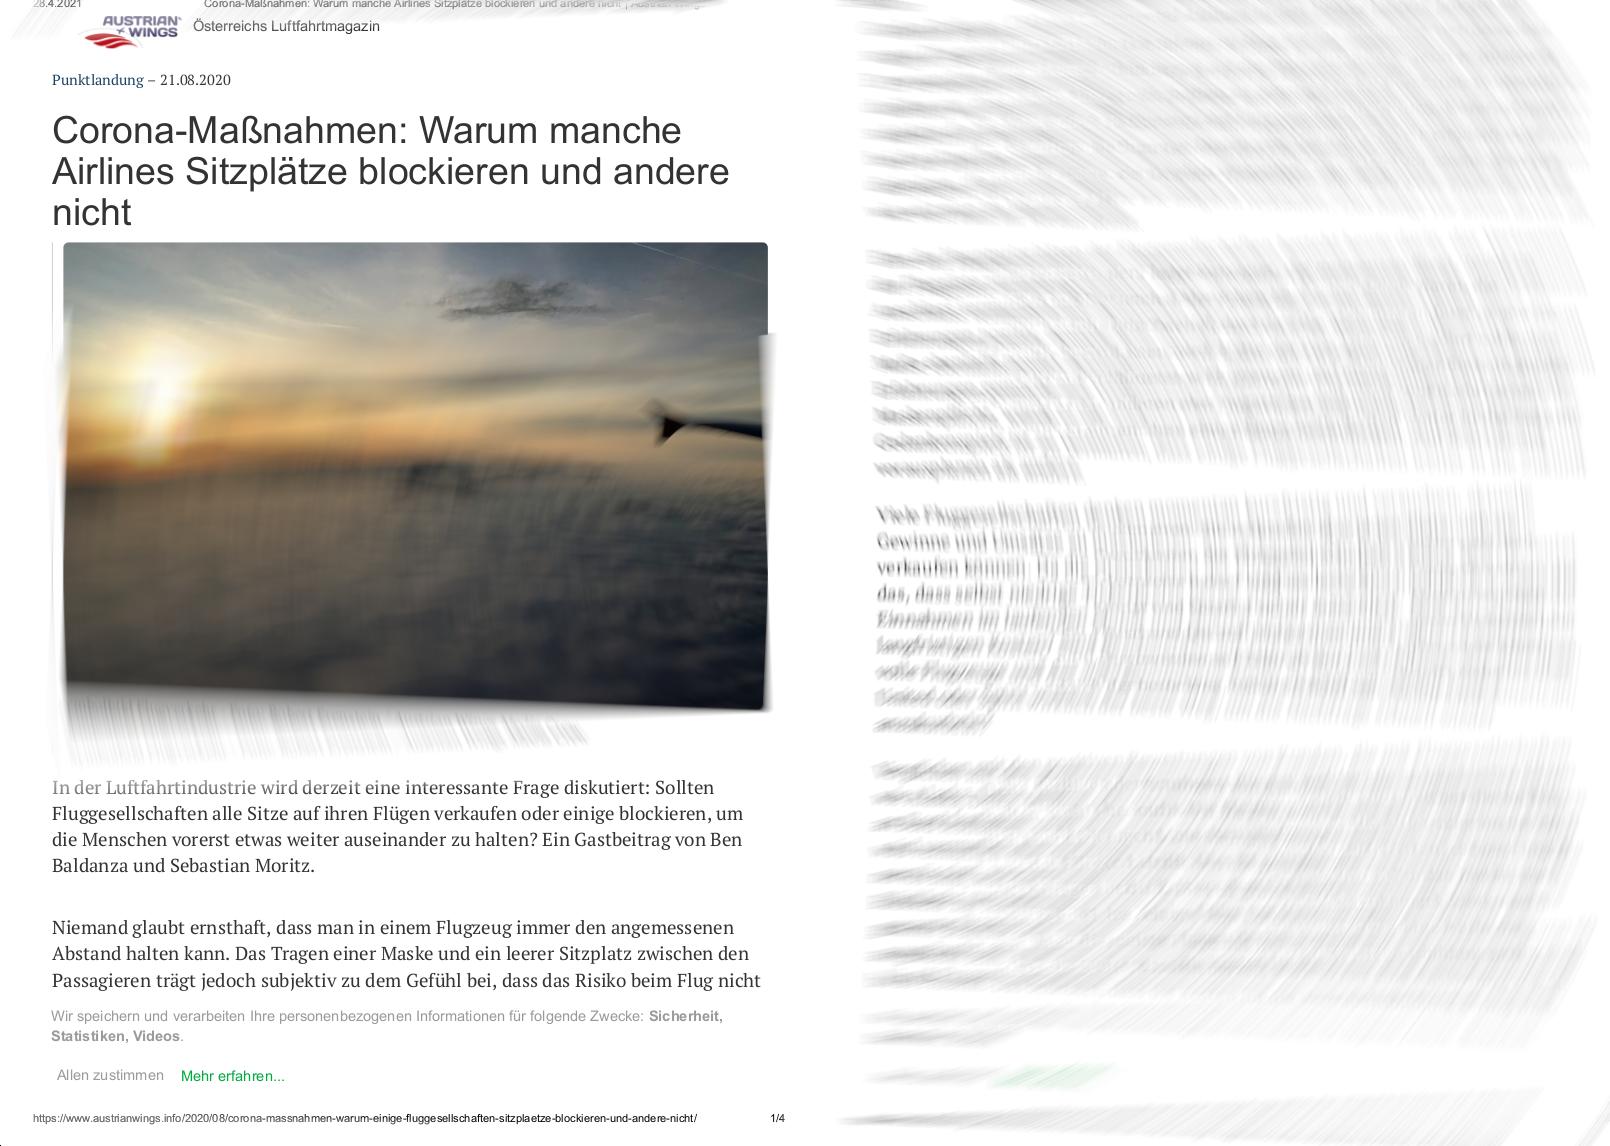 Austrian Wings: TWS Partners zu Corona-Maßnahmen von Airlines